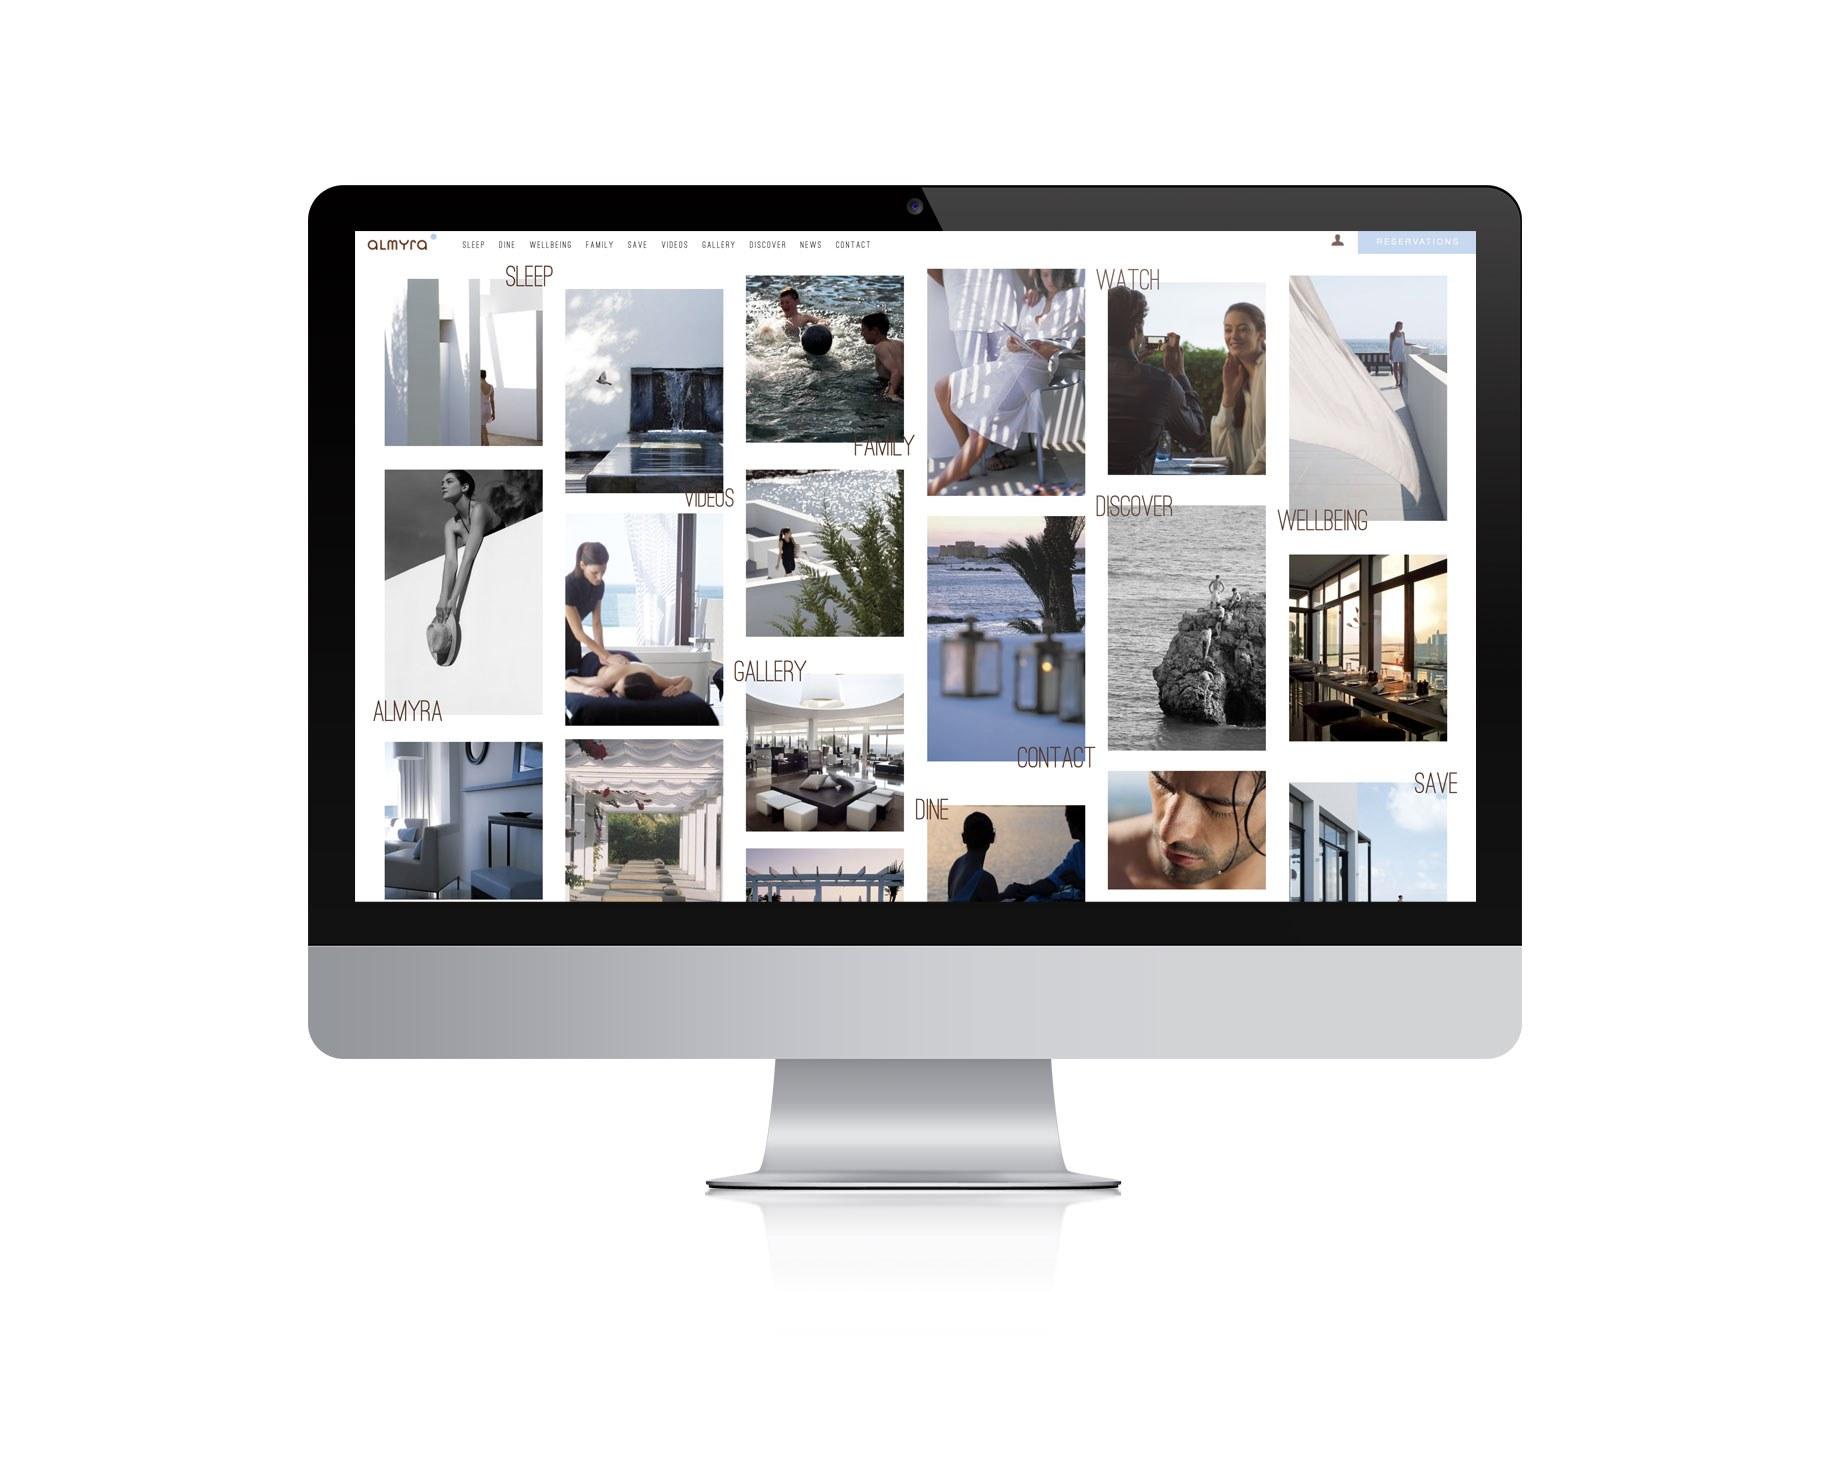 Almyra-Website-1.jpg